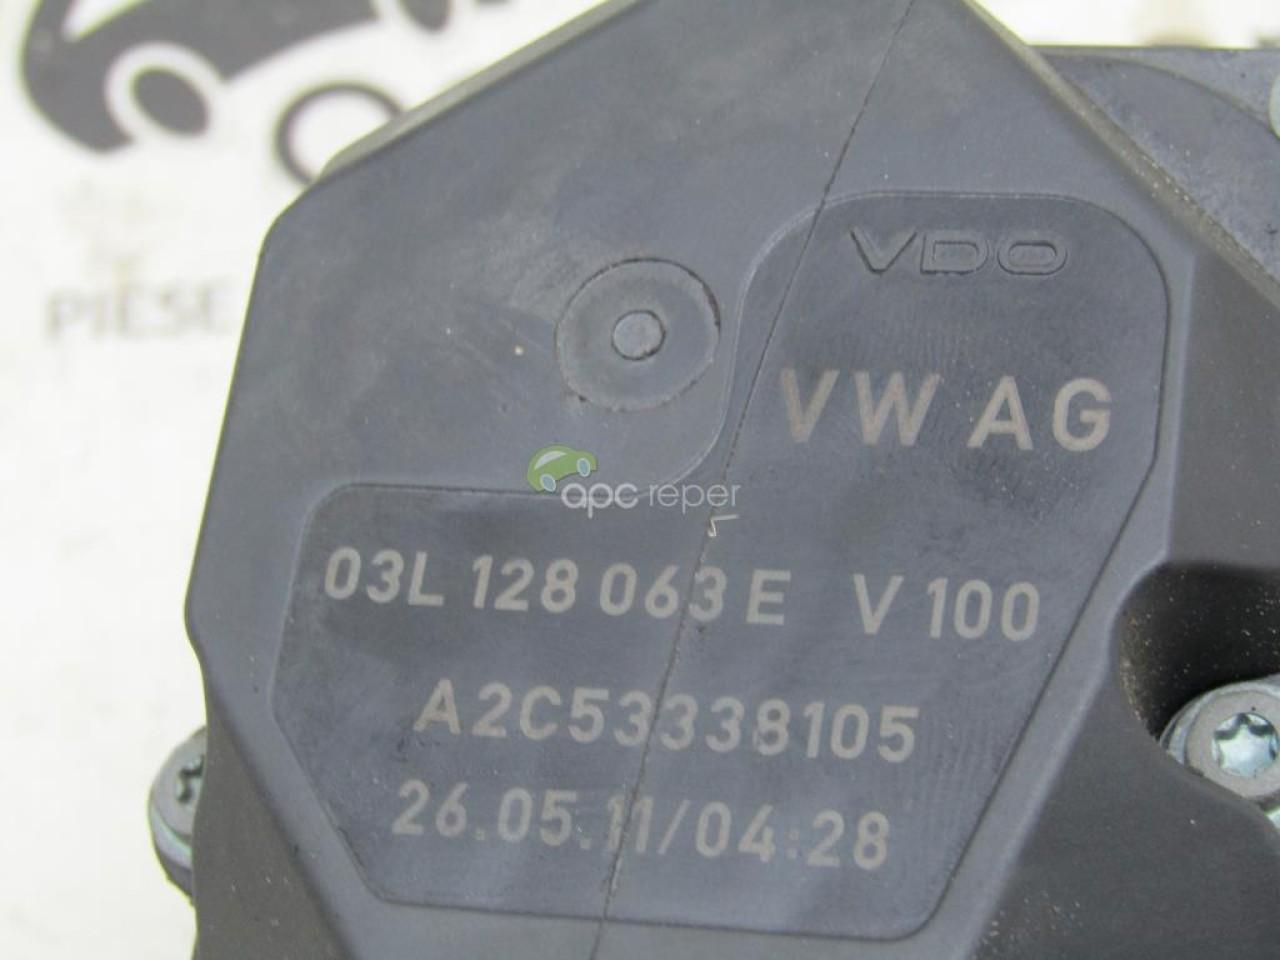 Clapeta acceleratie Audi A6 4G Facelift an 2011 cod 03L128063E